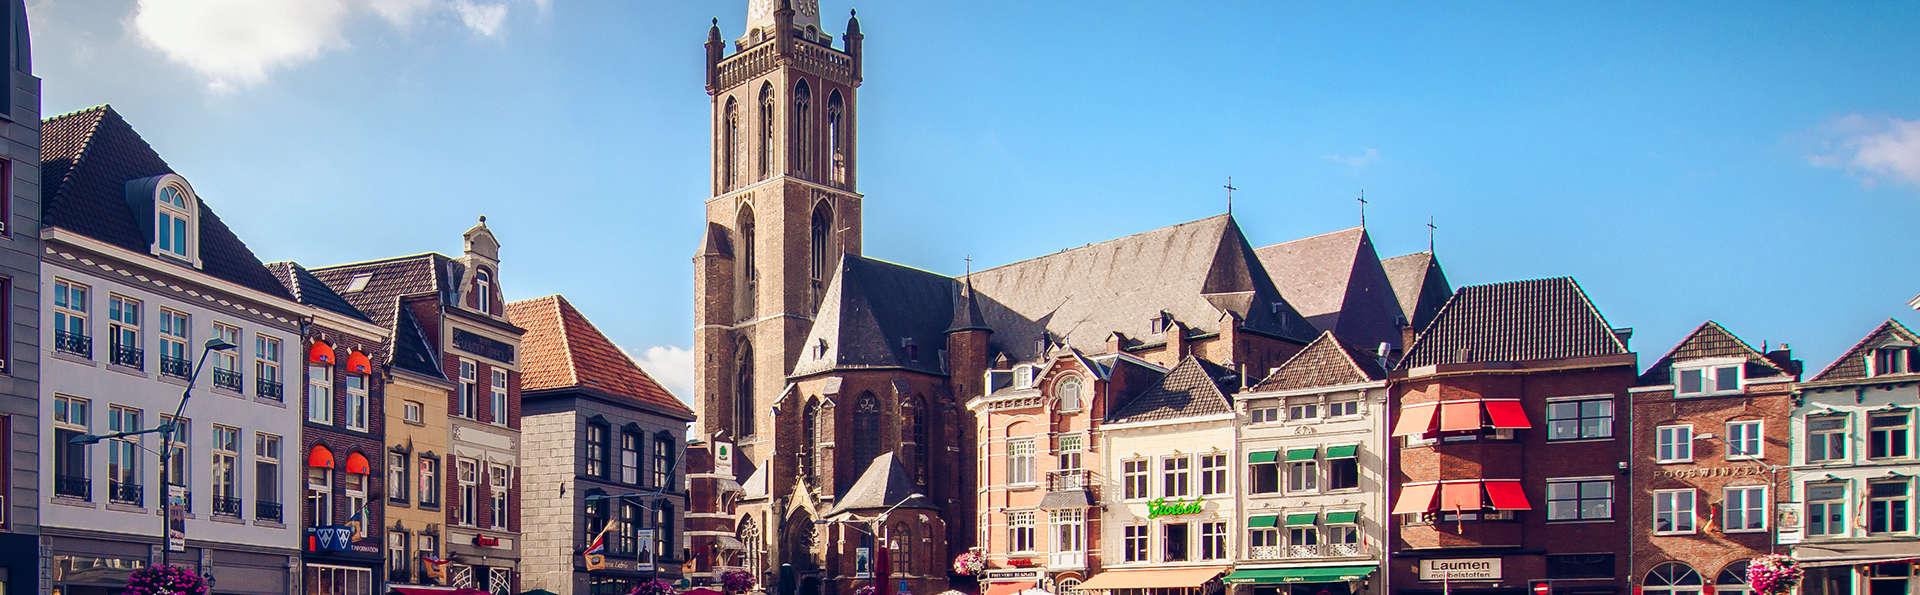 Fletcher Landhotel Bosrijk Roermond - EDIT_Destination_Roermond2.jpg